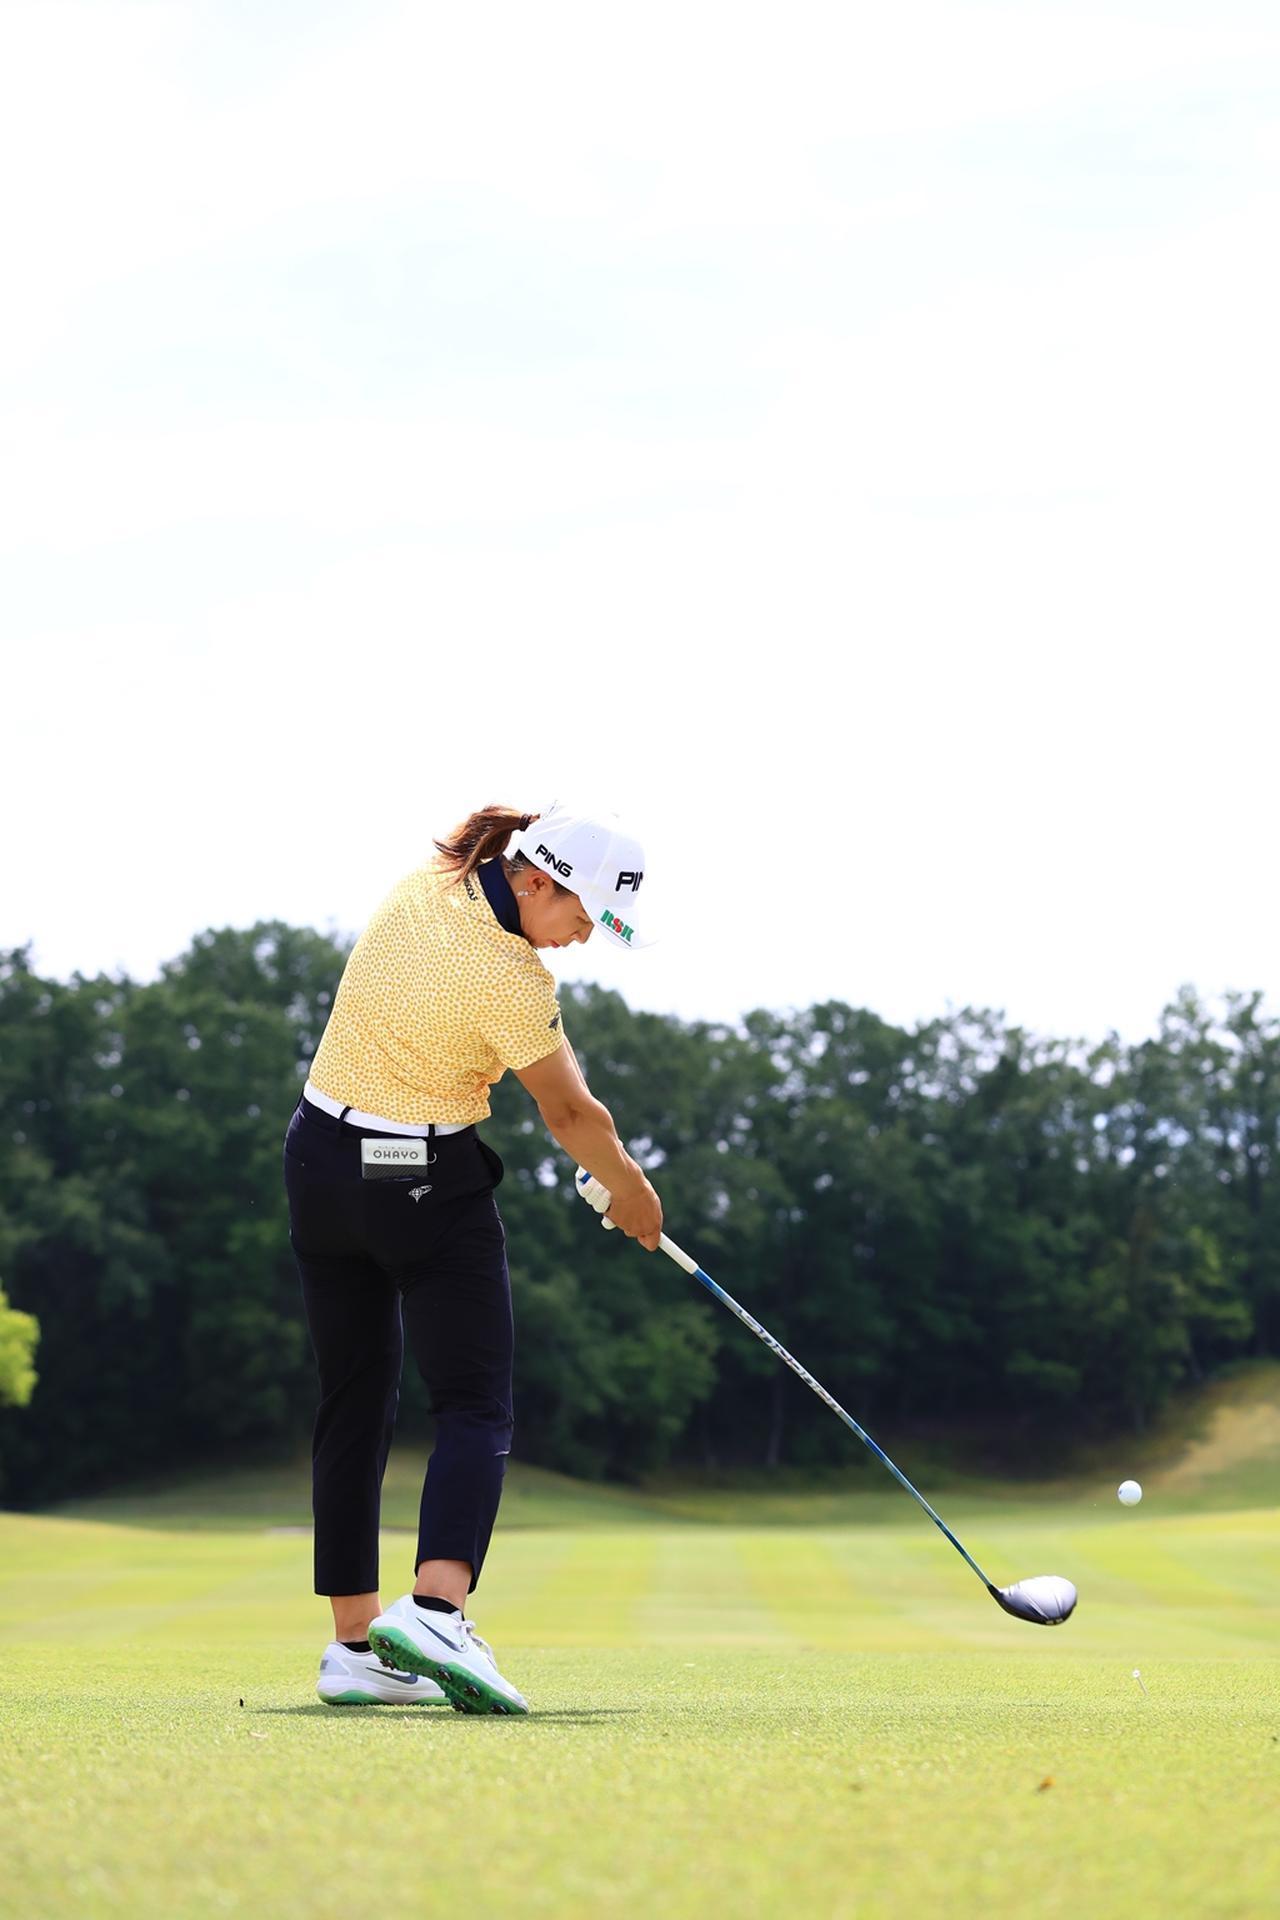 Images : 14番目の画像 - 渋野日向子のドライバー後方連続写真 - みんなのゴルフダイジェスト